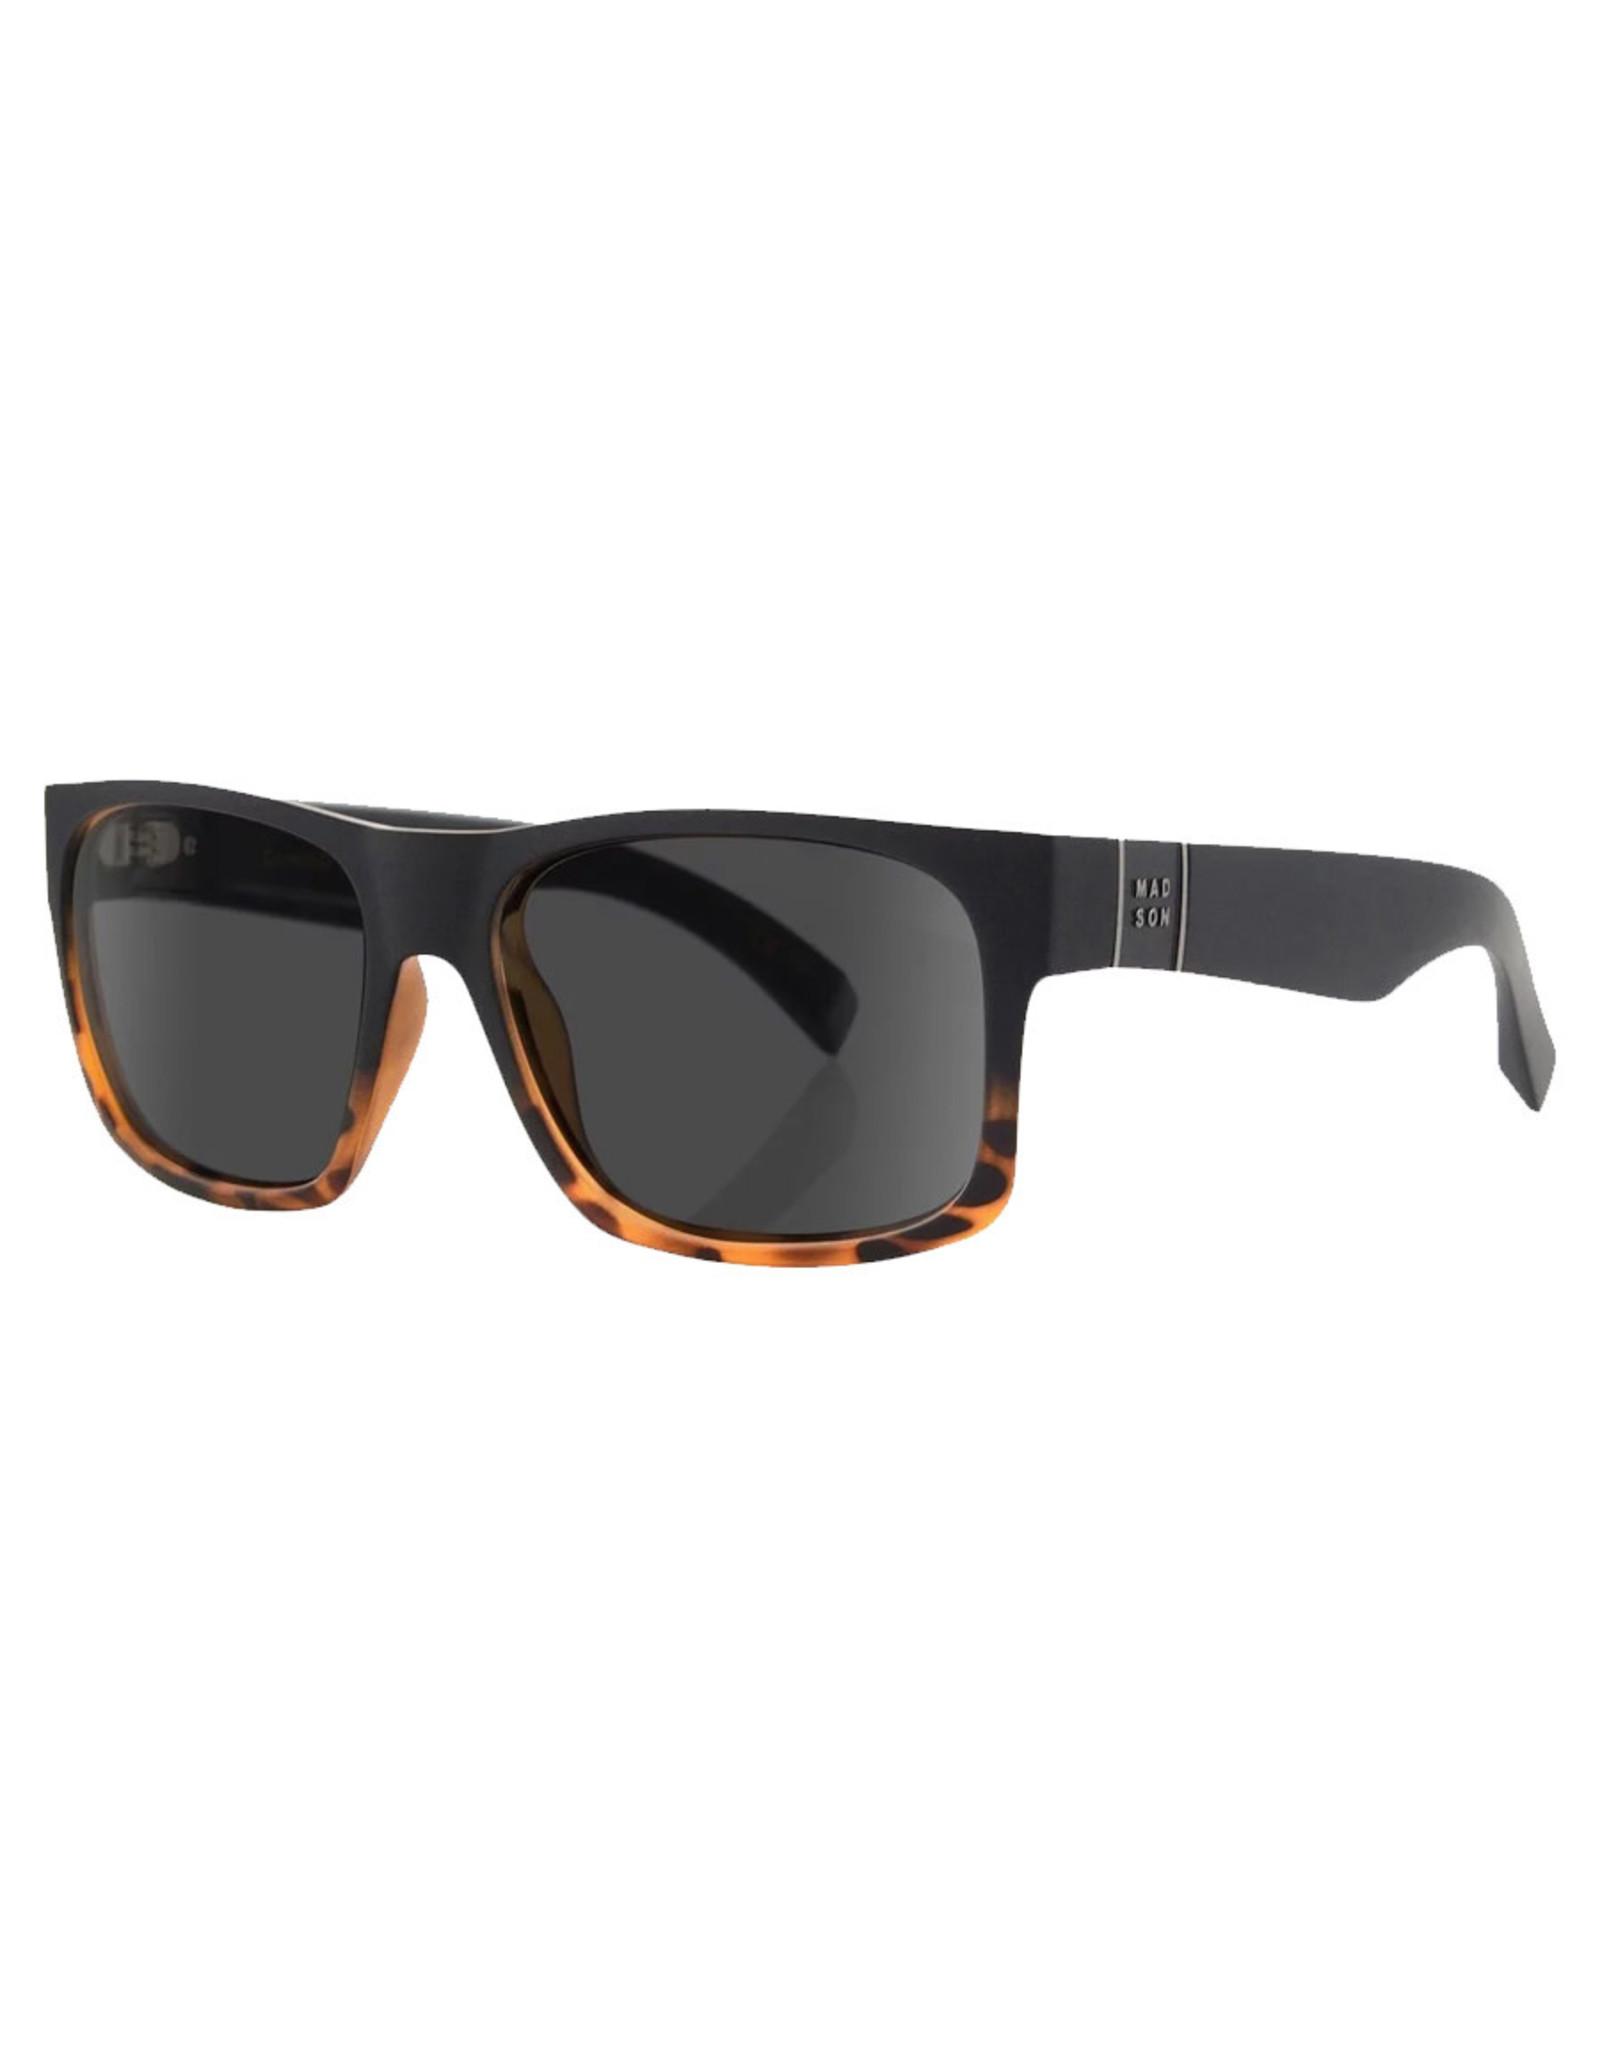 Madson Madson Sunglasses Classico (Black Tort Fade/Grey Polarized Lens)